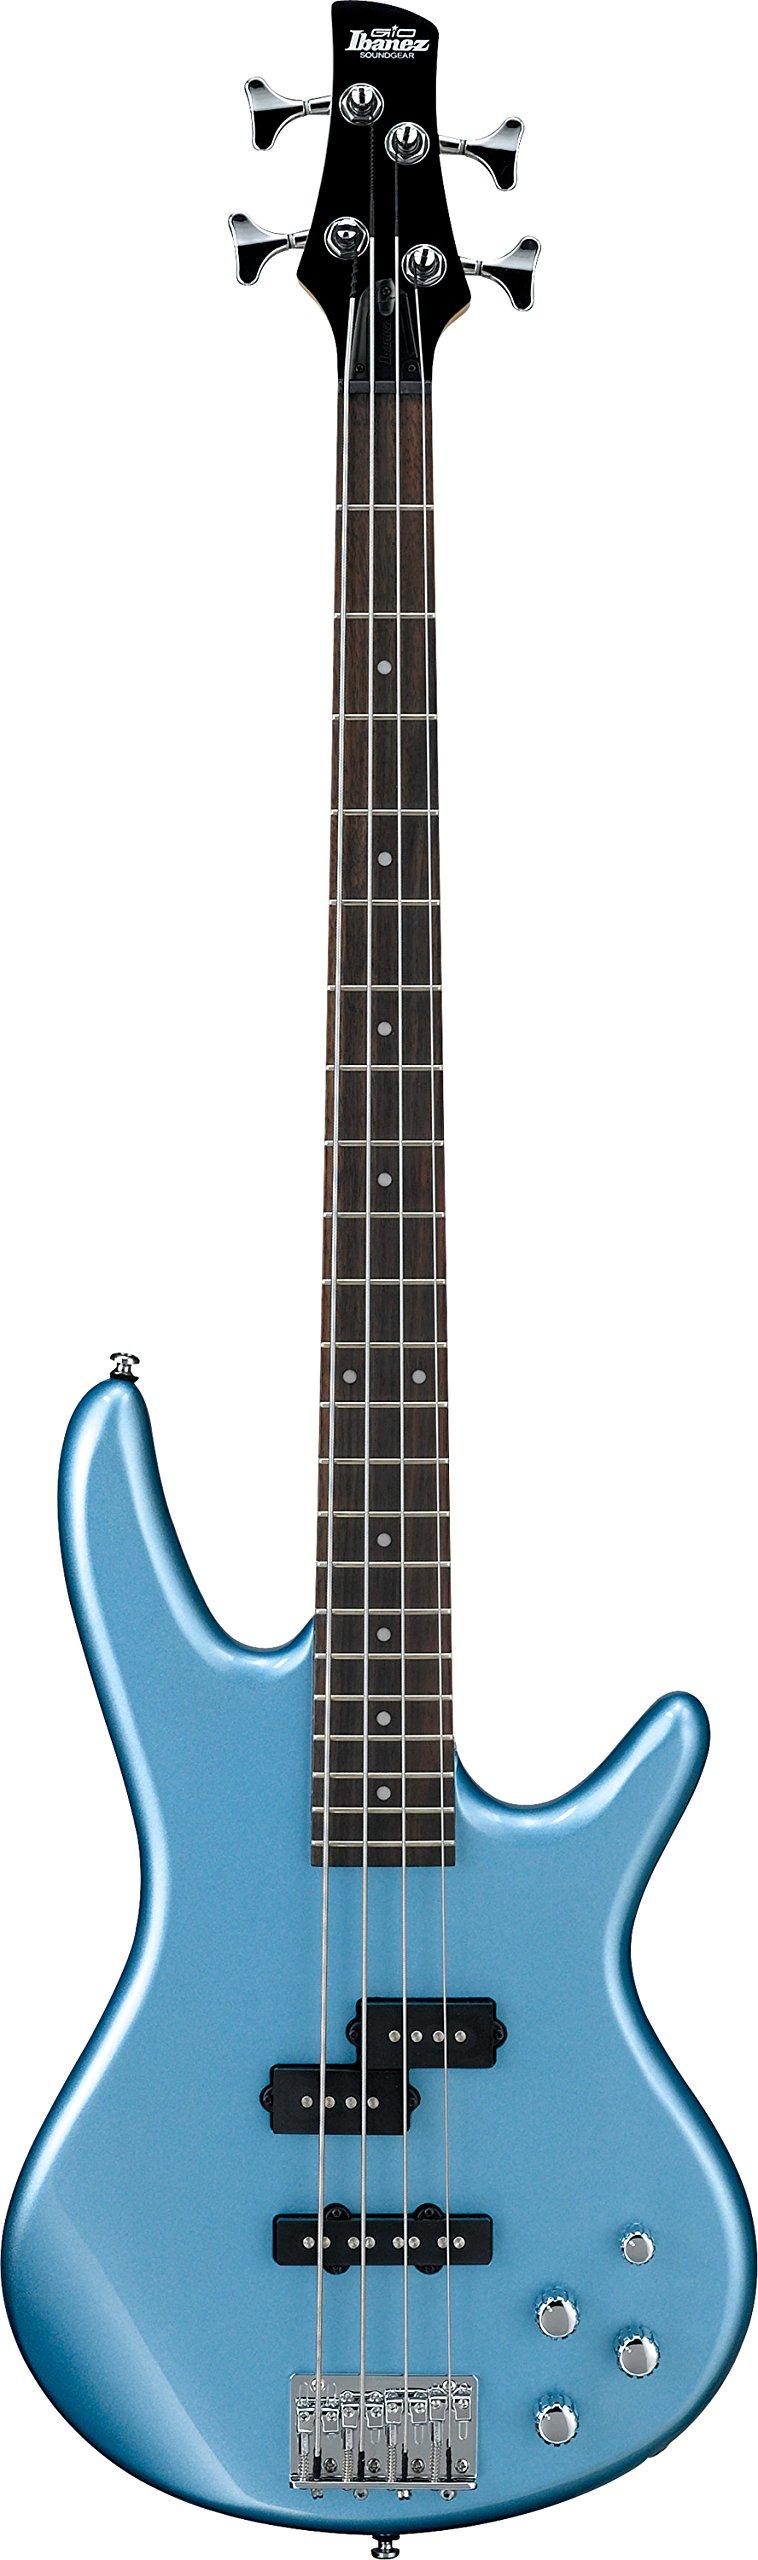 Ibanez 4 String Bass Guitar Right Handed, Soda Blue GSR200SDL